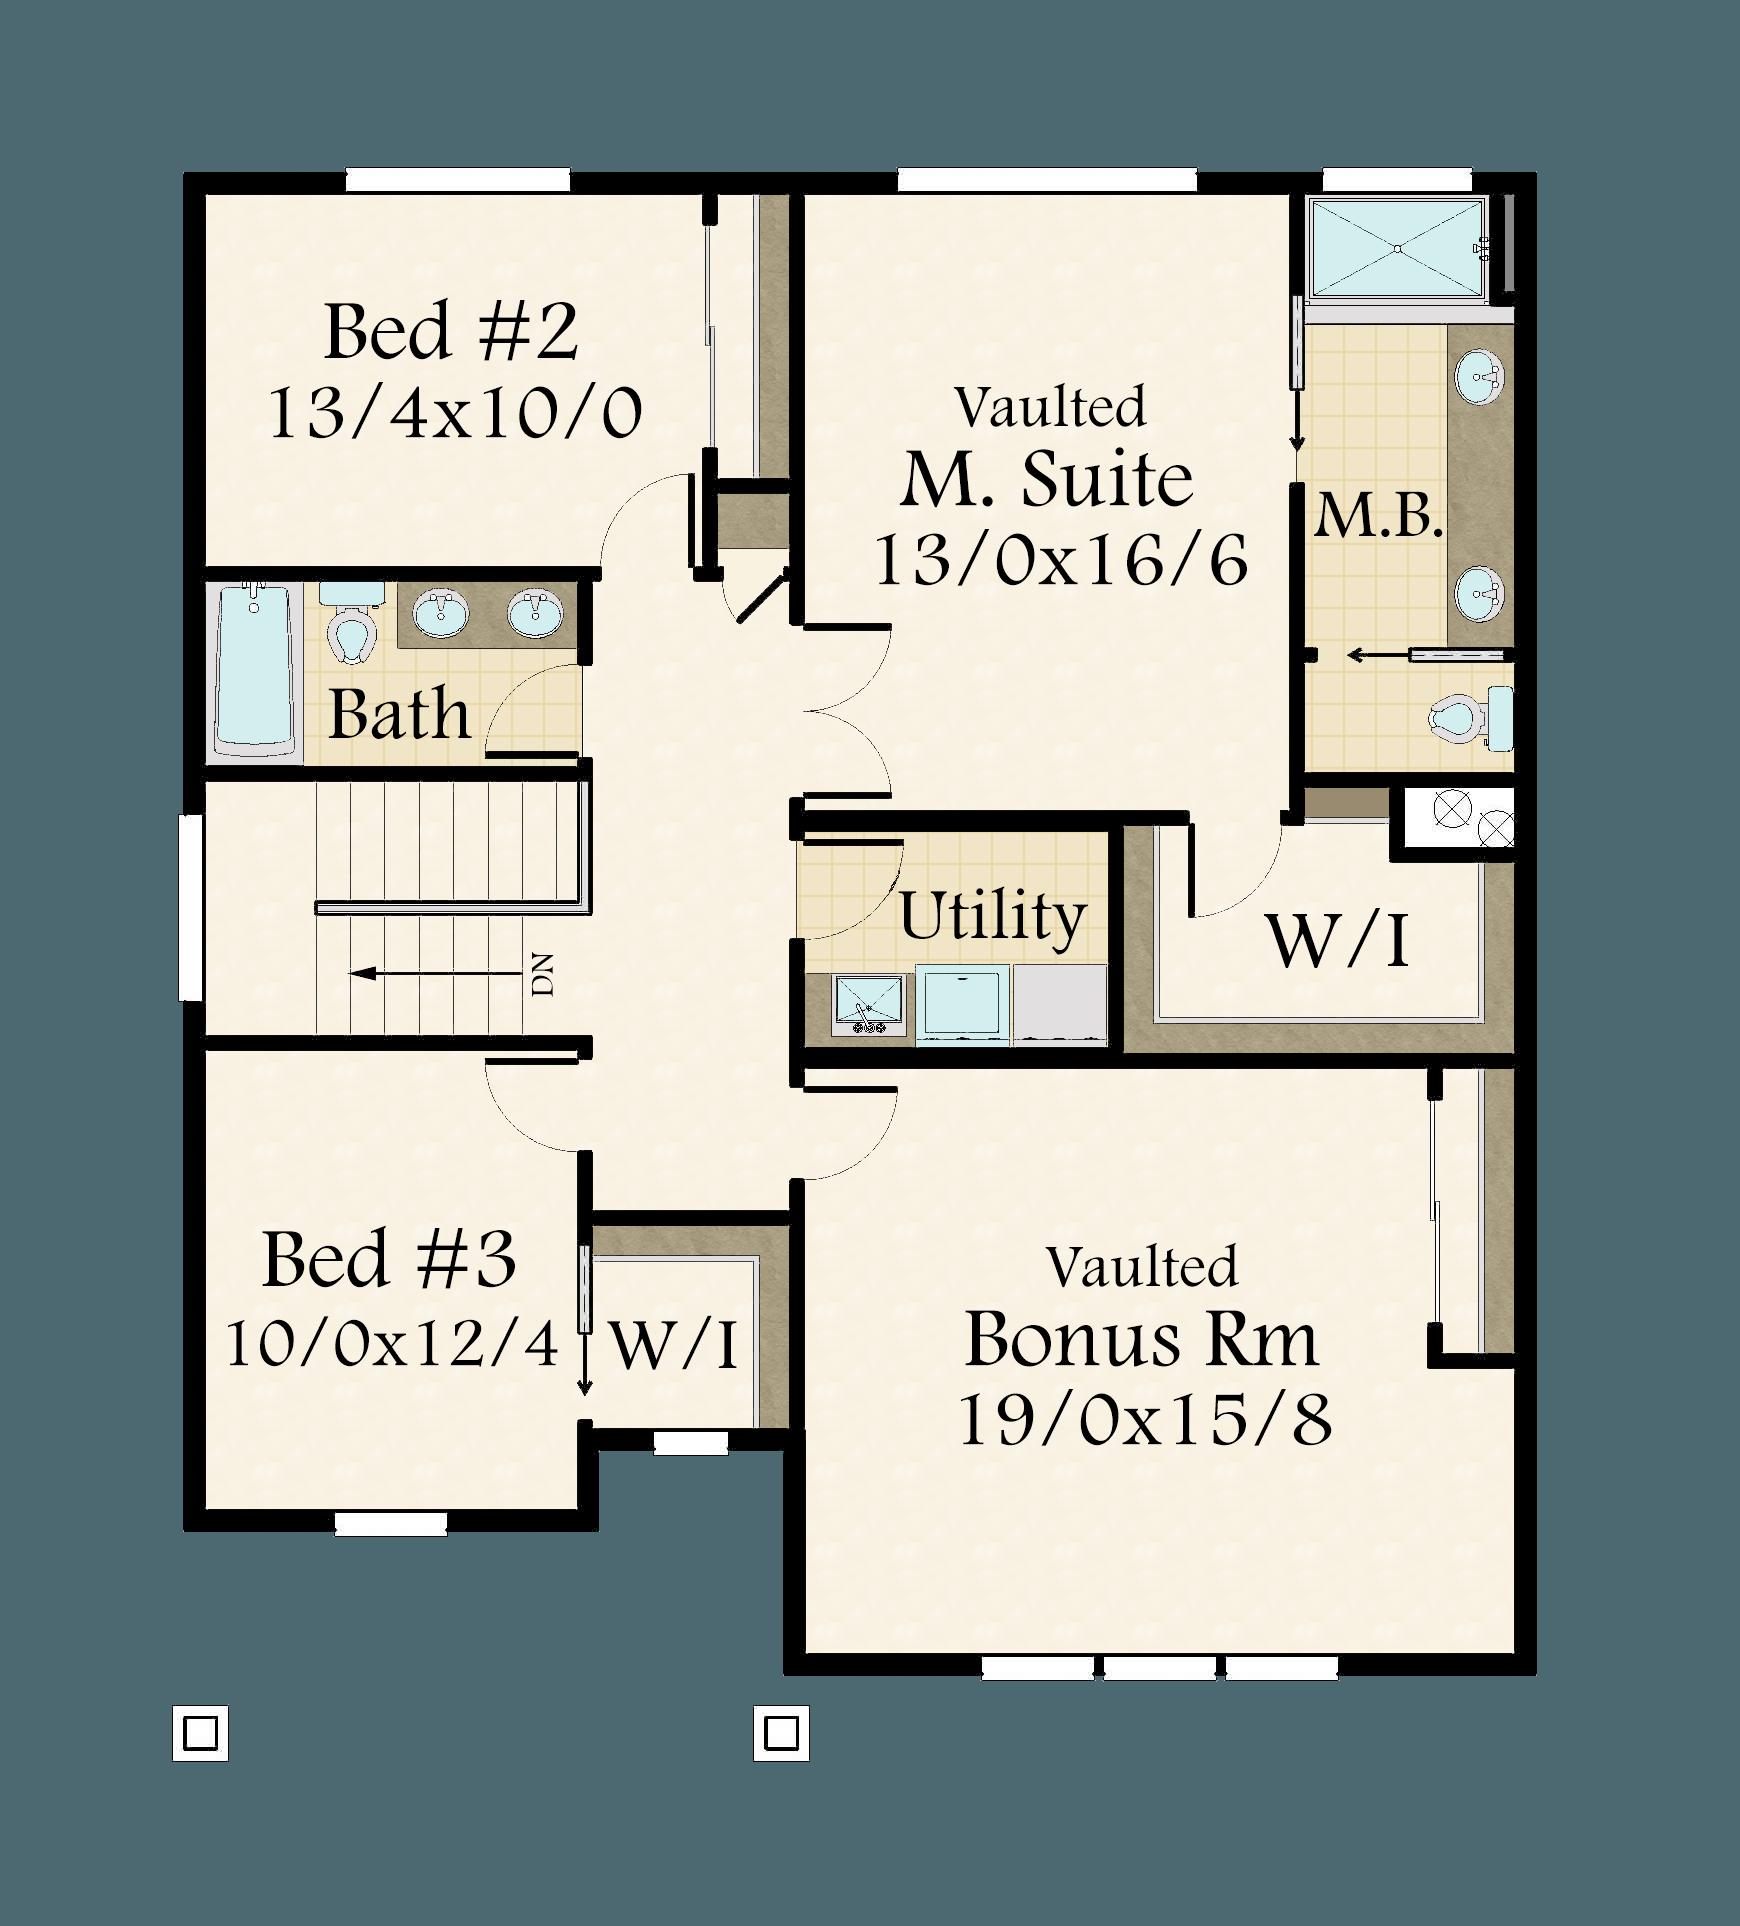 Detached Garage Plan By Mark Stewart Home Design: Affordable Craftsman House Plan By Mark Stewart